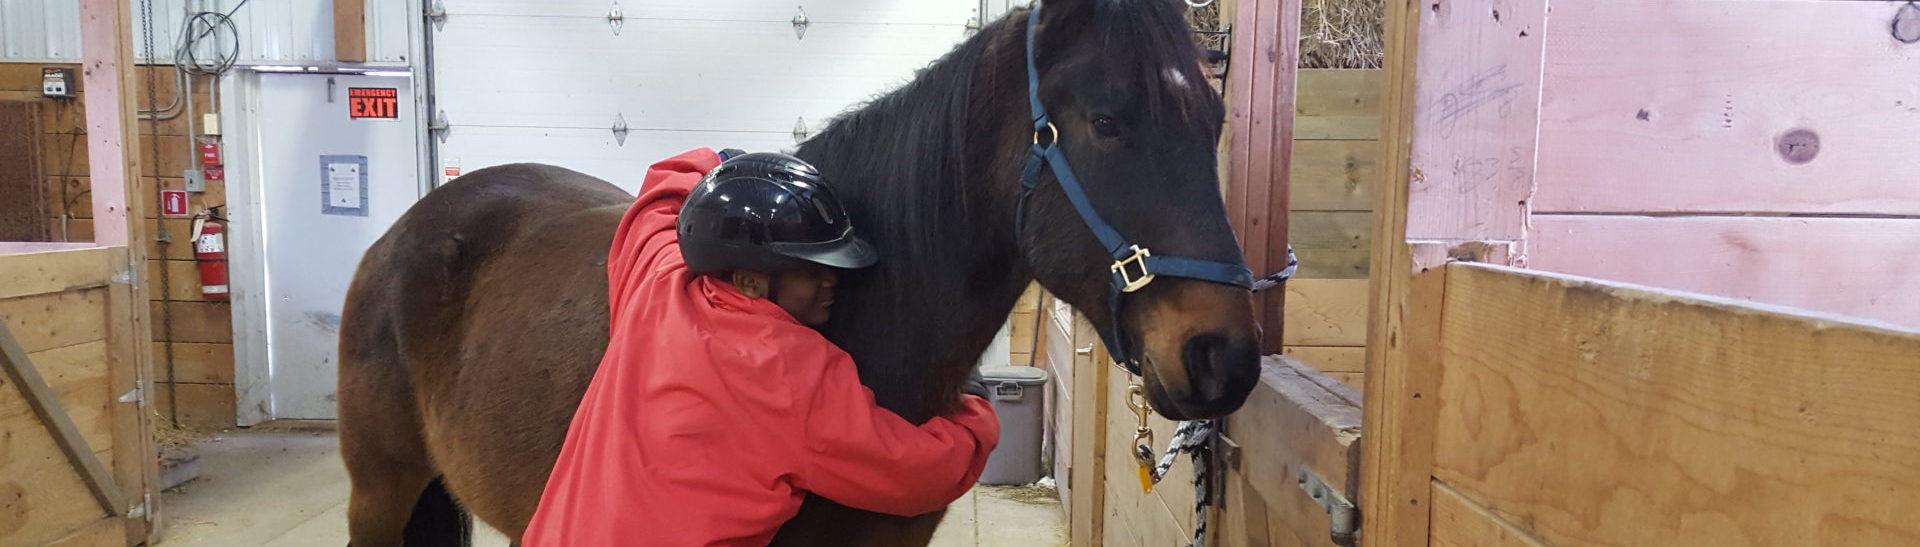 Student hugging horse